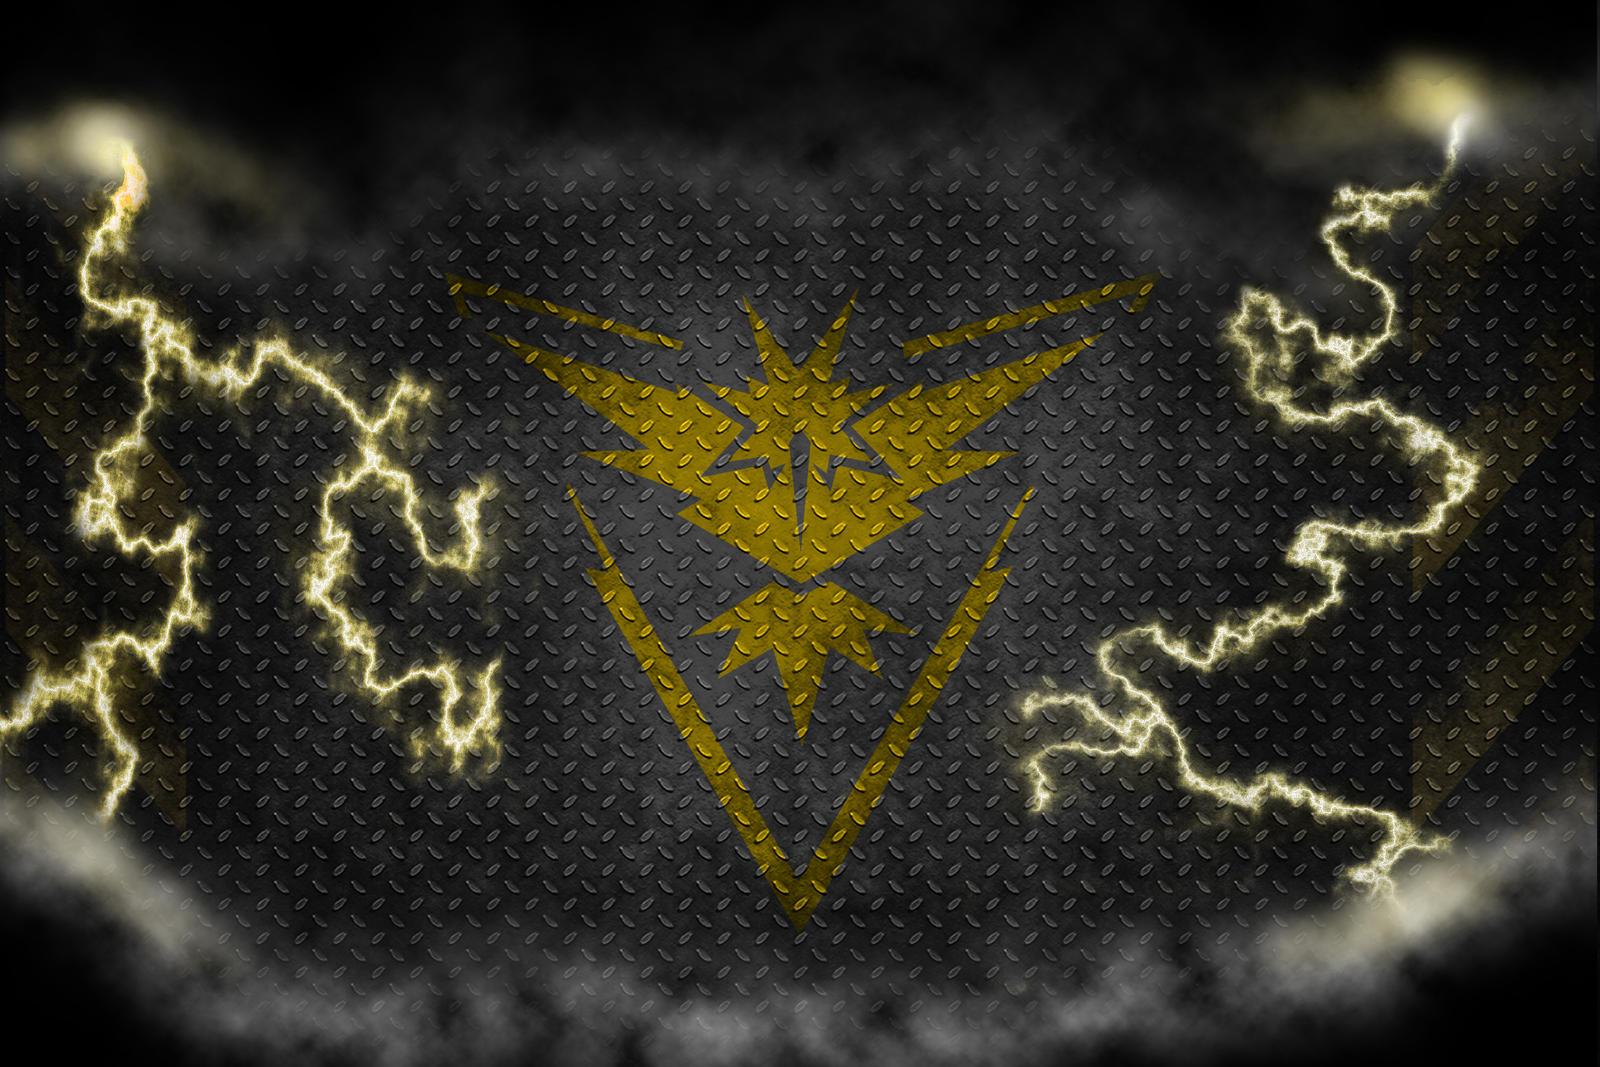 Team Instinct Wallpaper Pokemon Go: Team Instinct Wallpaper By Thejohan On DeviantArt